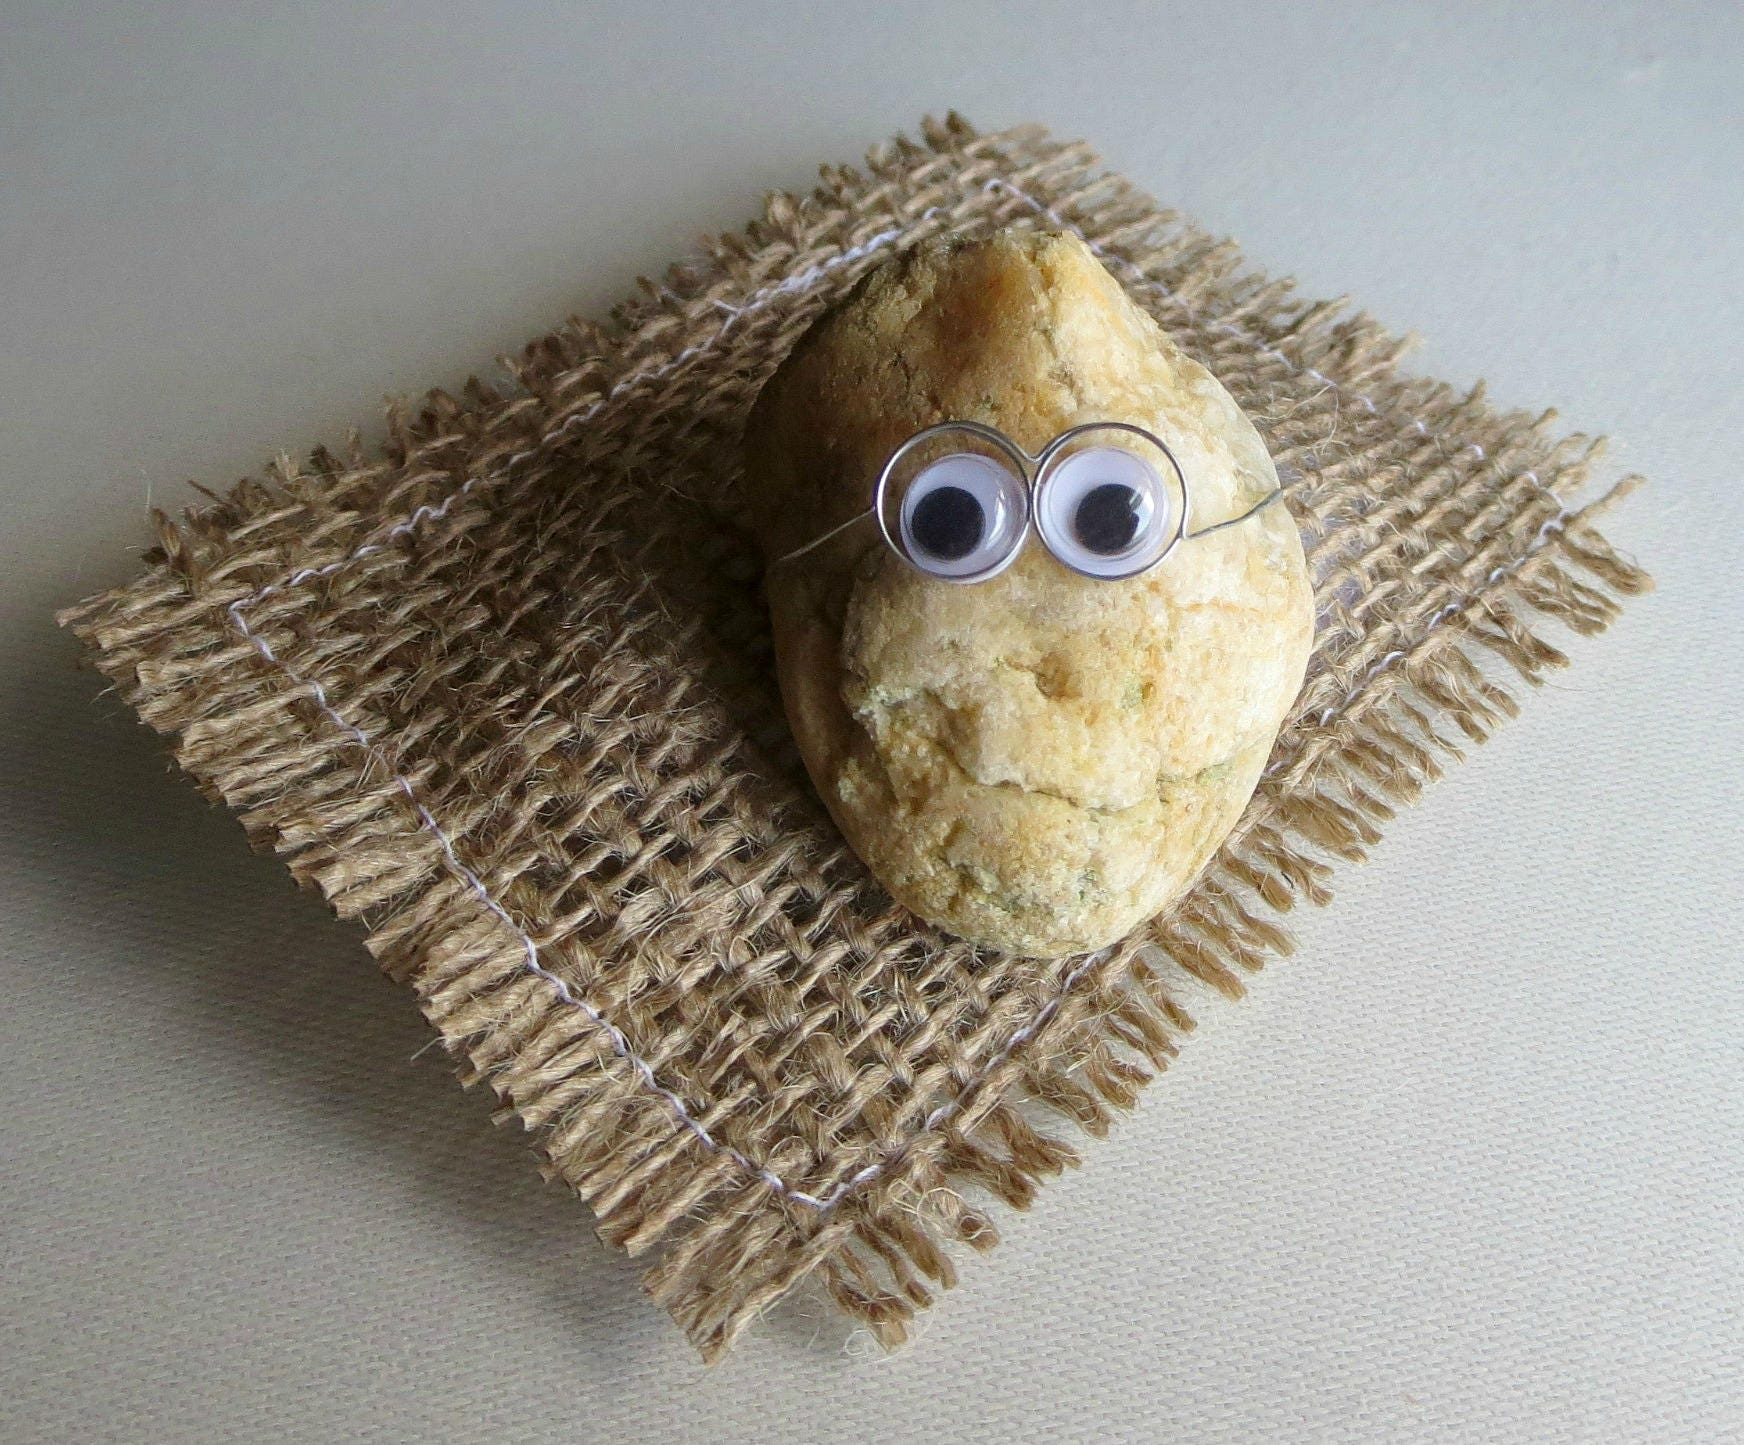 02e5ea36f1d3e Pet Rock collectible googley eyes wire glasses natural